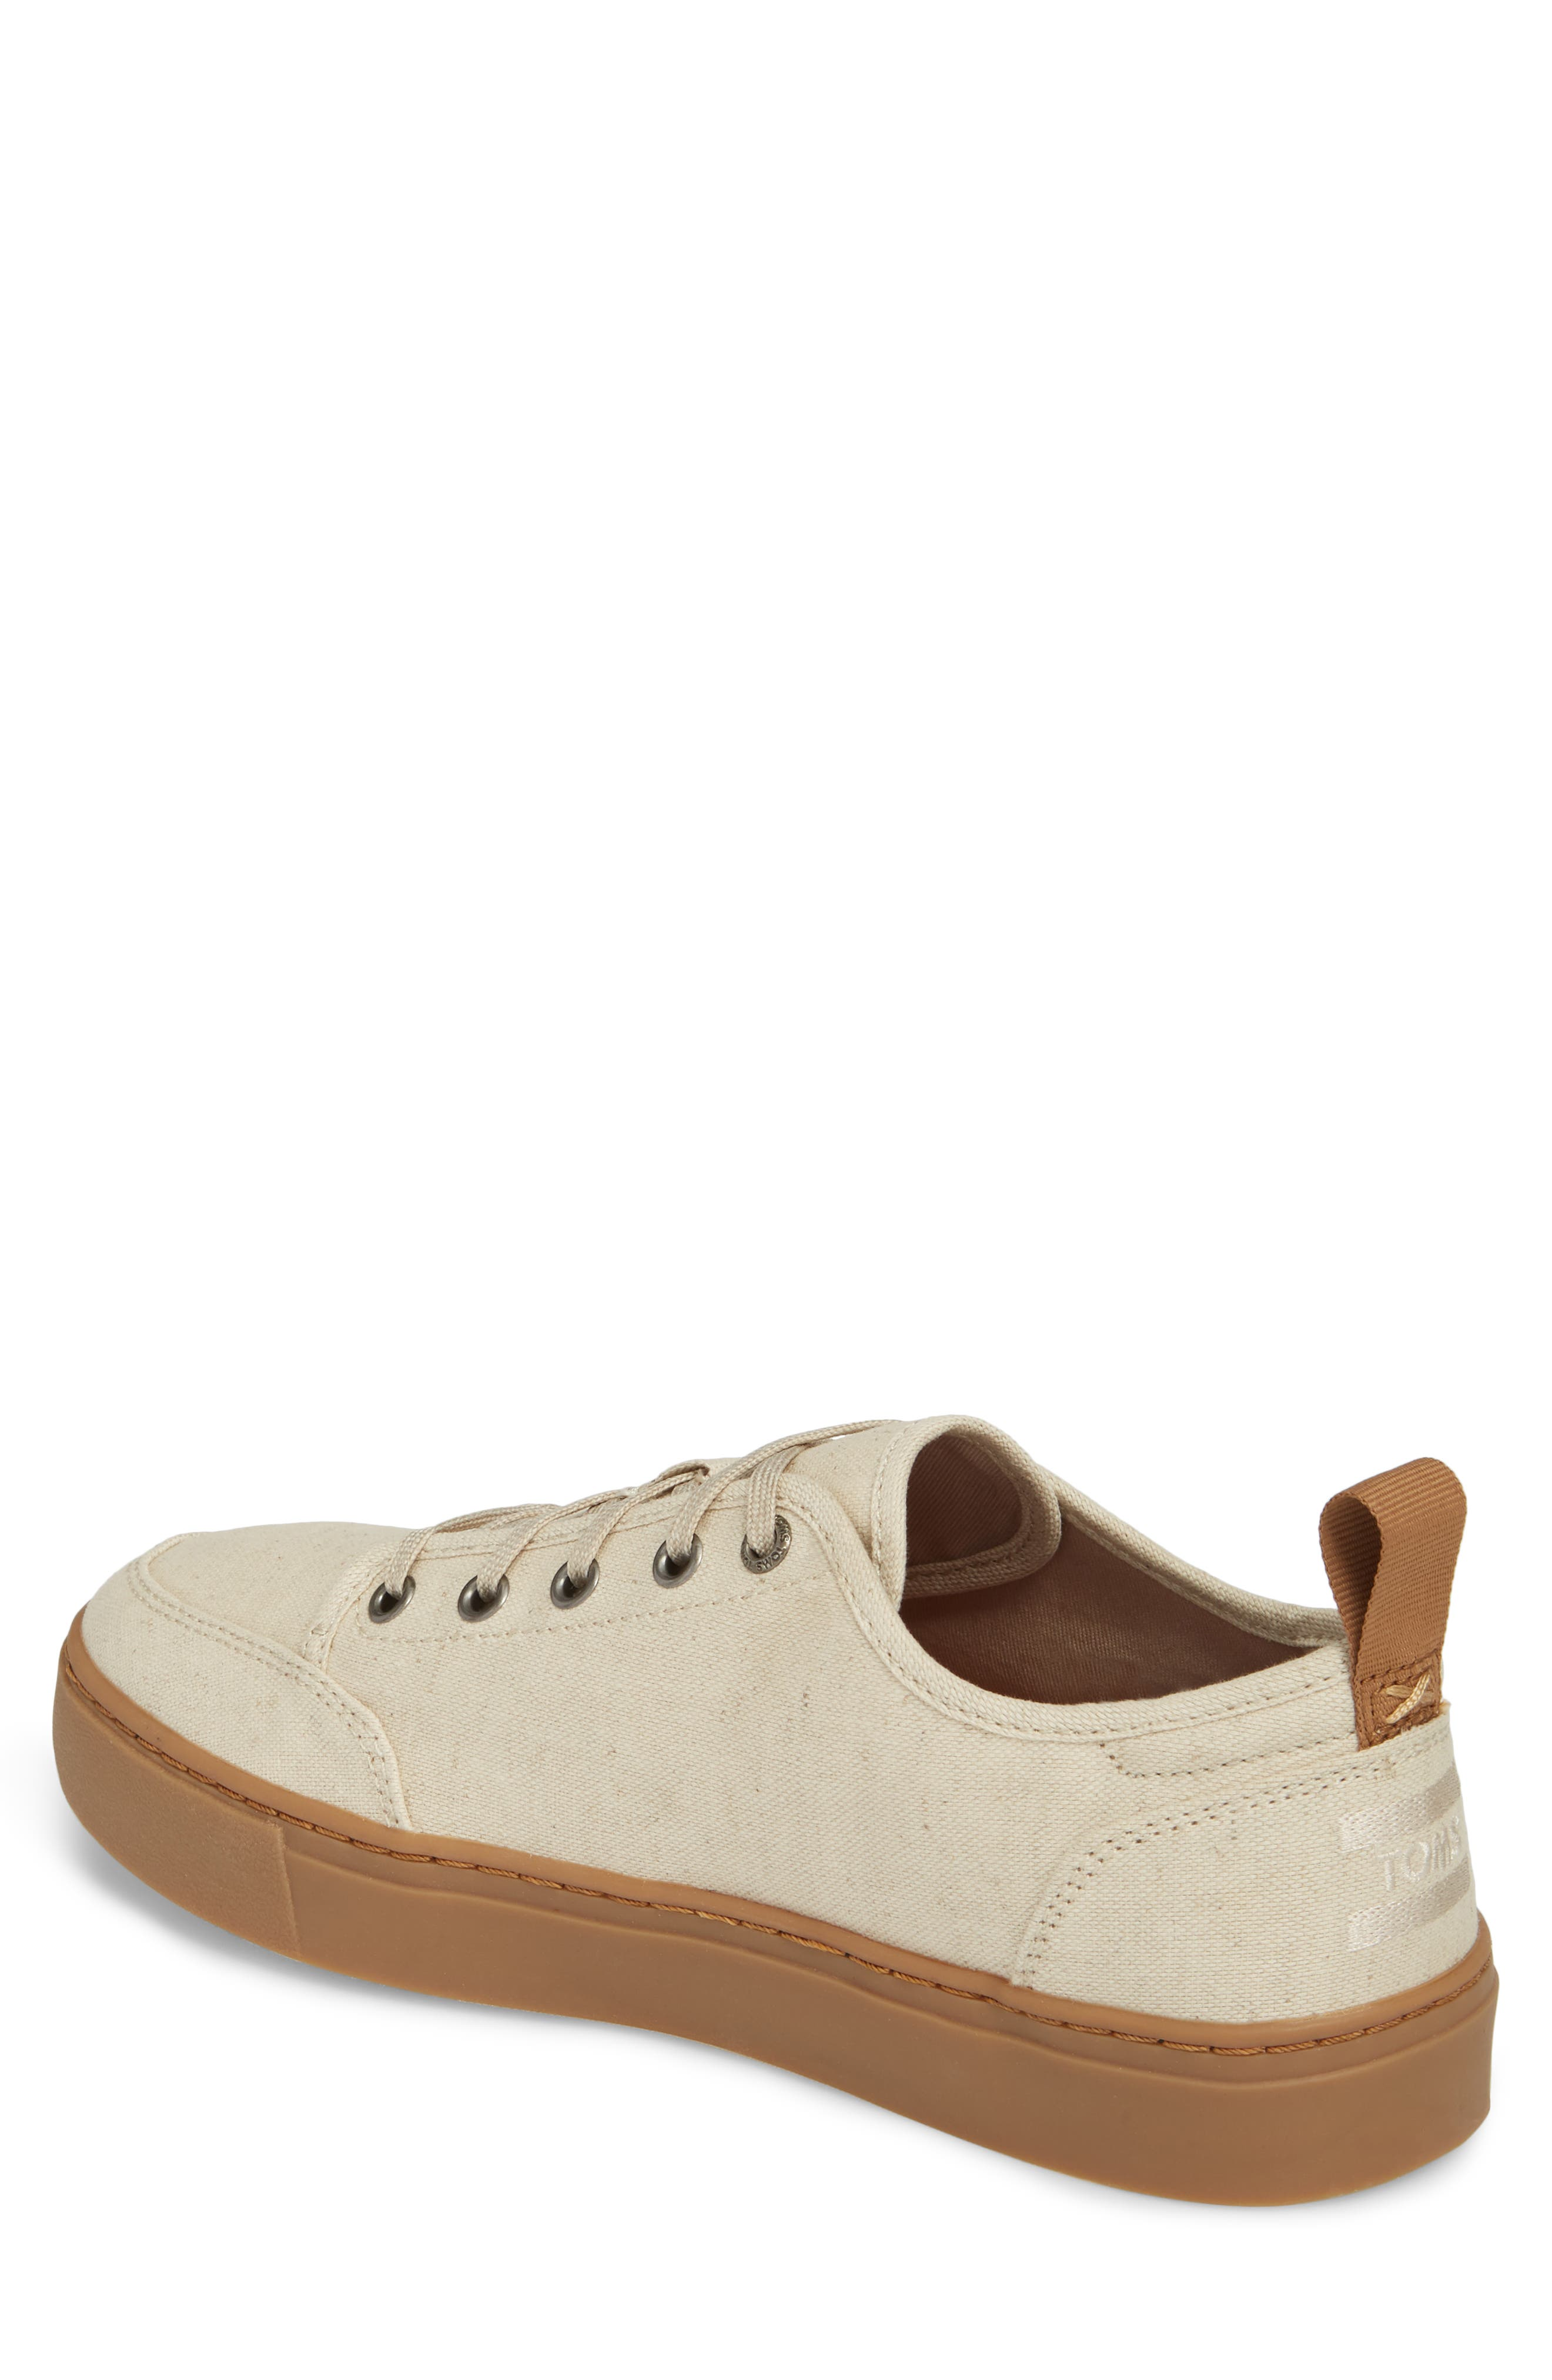 Landen Low Top Sneaker,                             Alternate thumbnail 2, color,                             NATURAL HEMP/ GUM